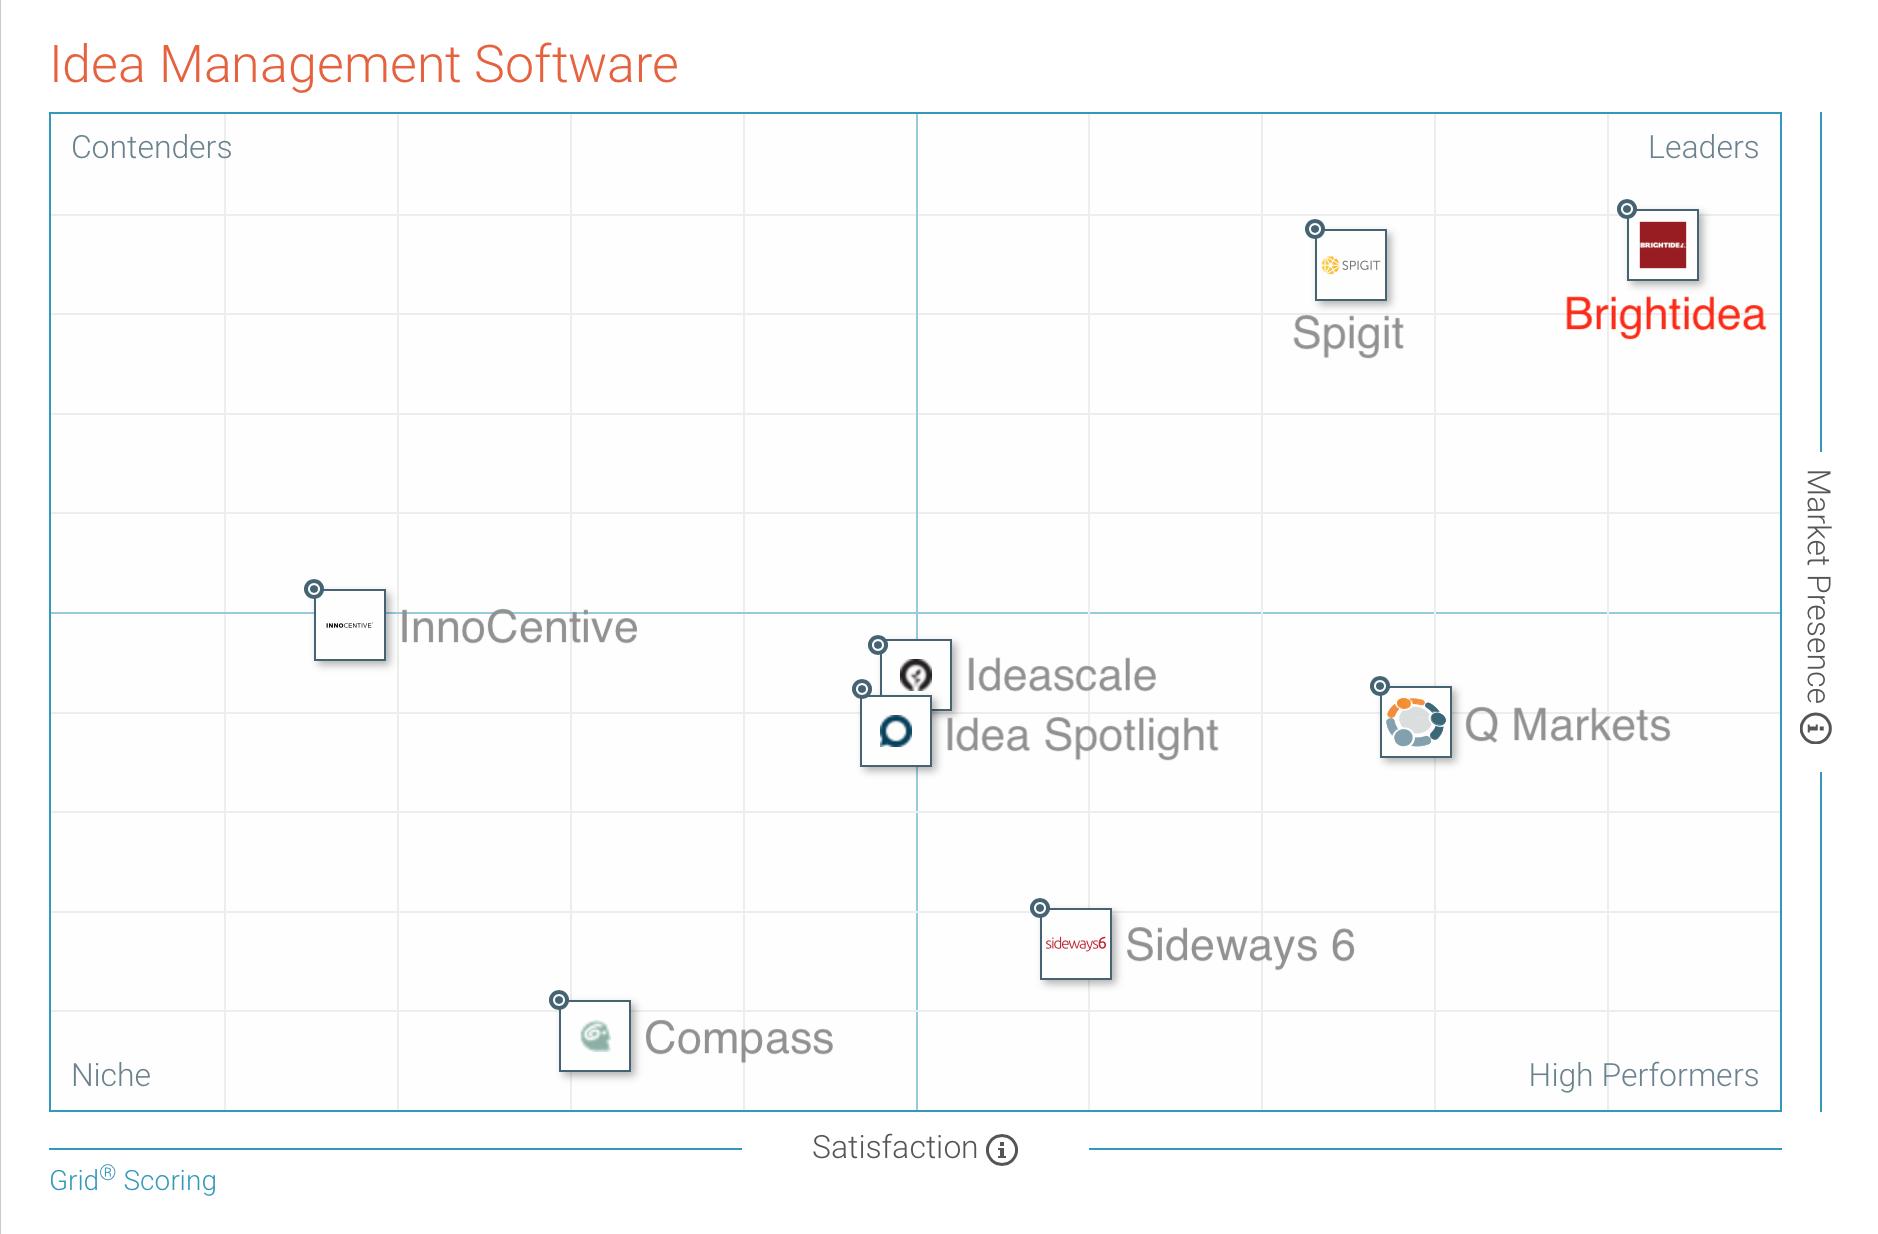 Brightidea G2Crowd Innovation Management Software Grid